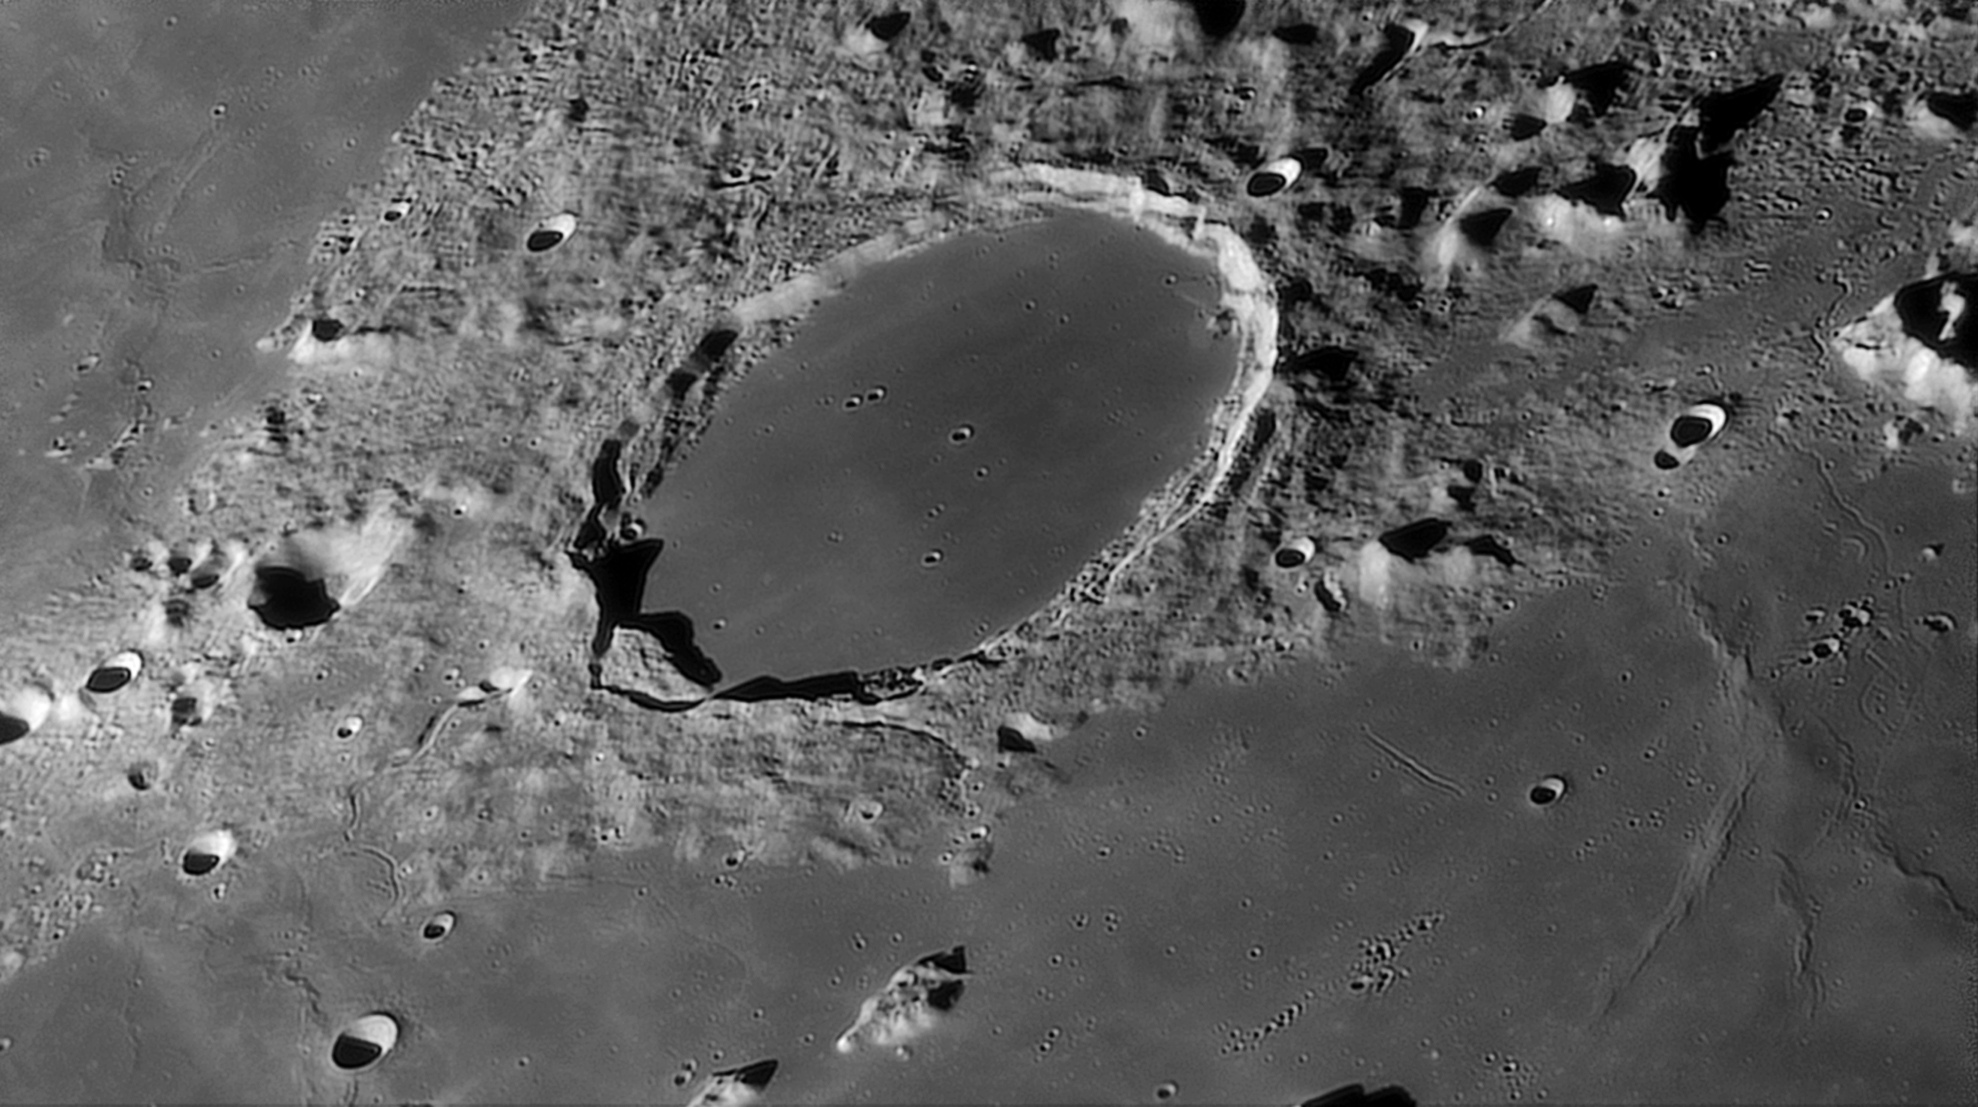 large.Moon_07_11_2020_03_45_46_R_.jpg.ae23c9a51baebd49d9571e5dd4064d18.jpg